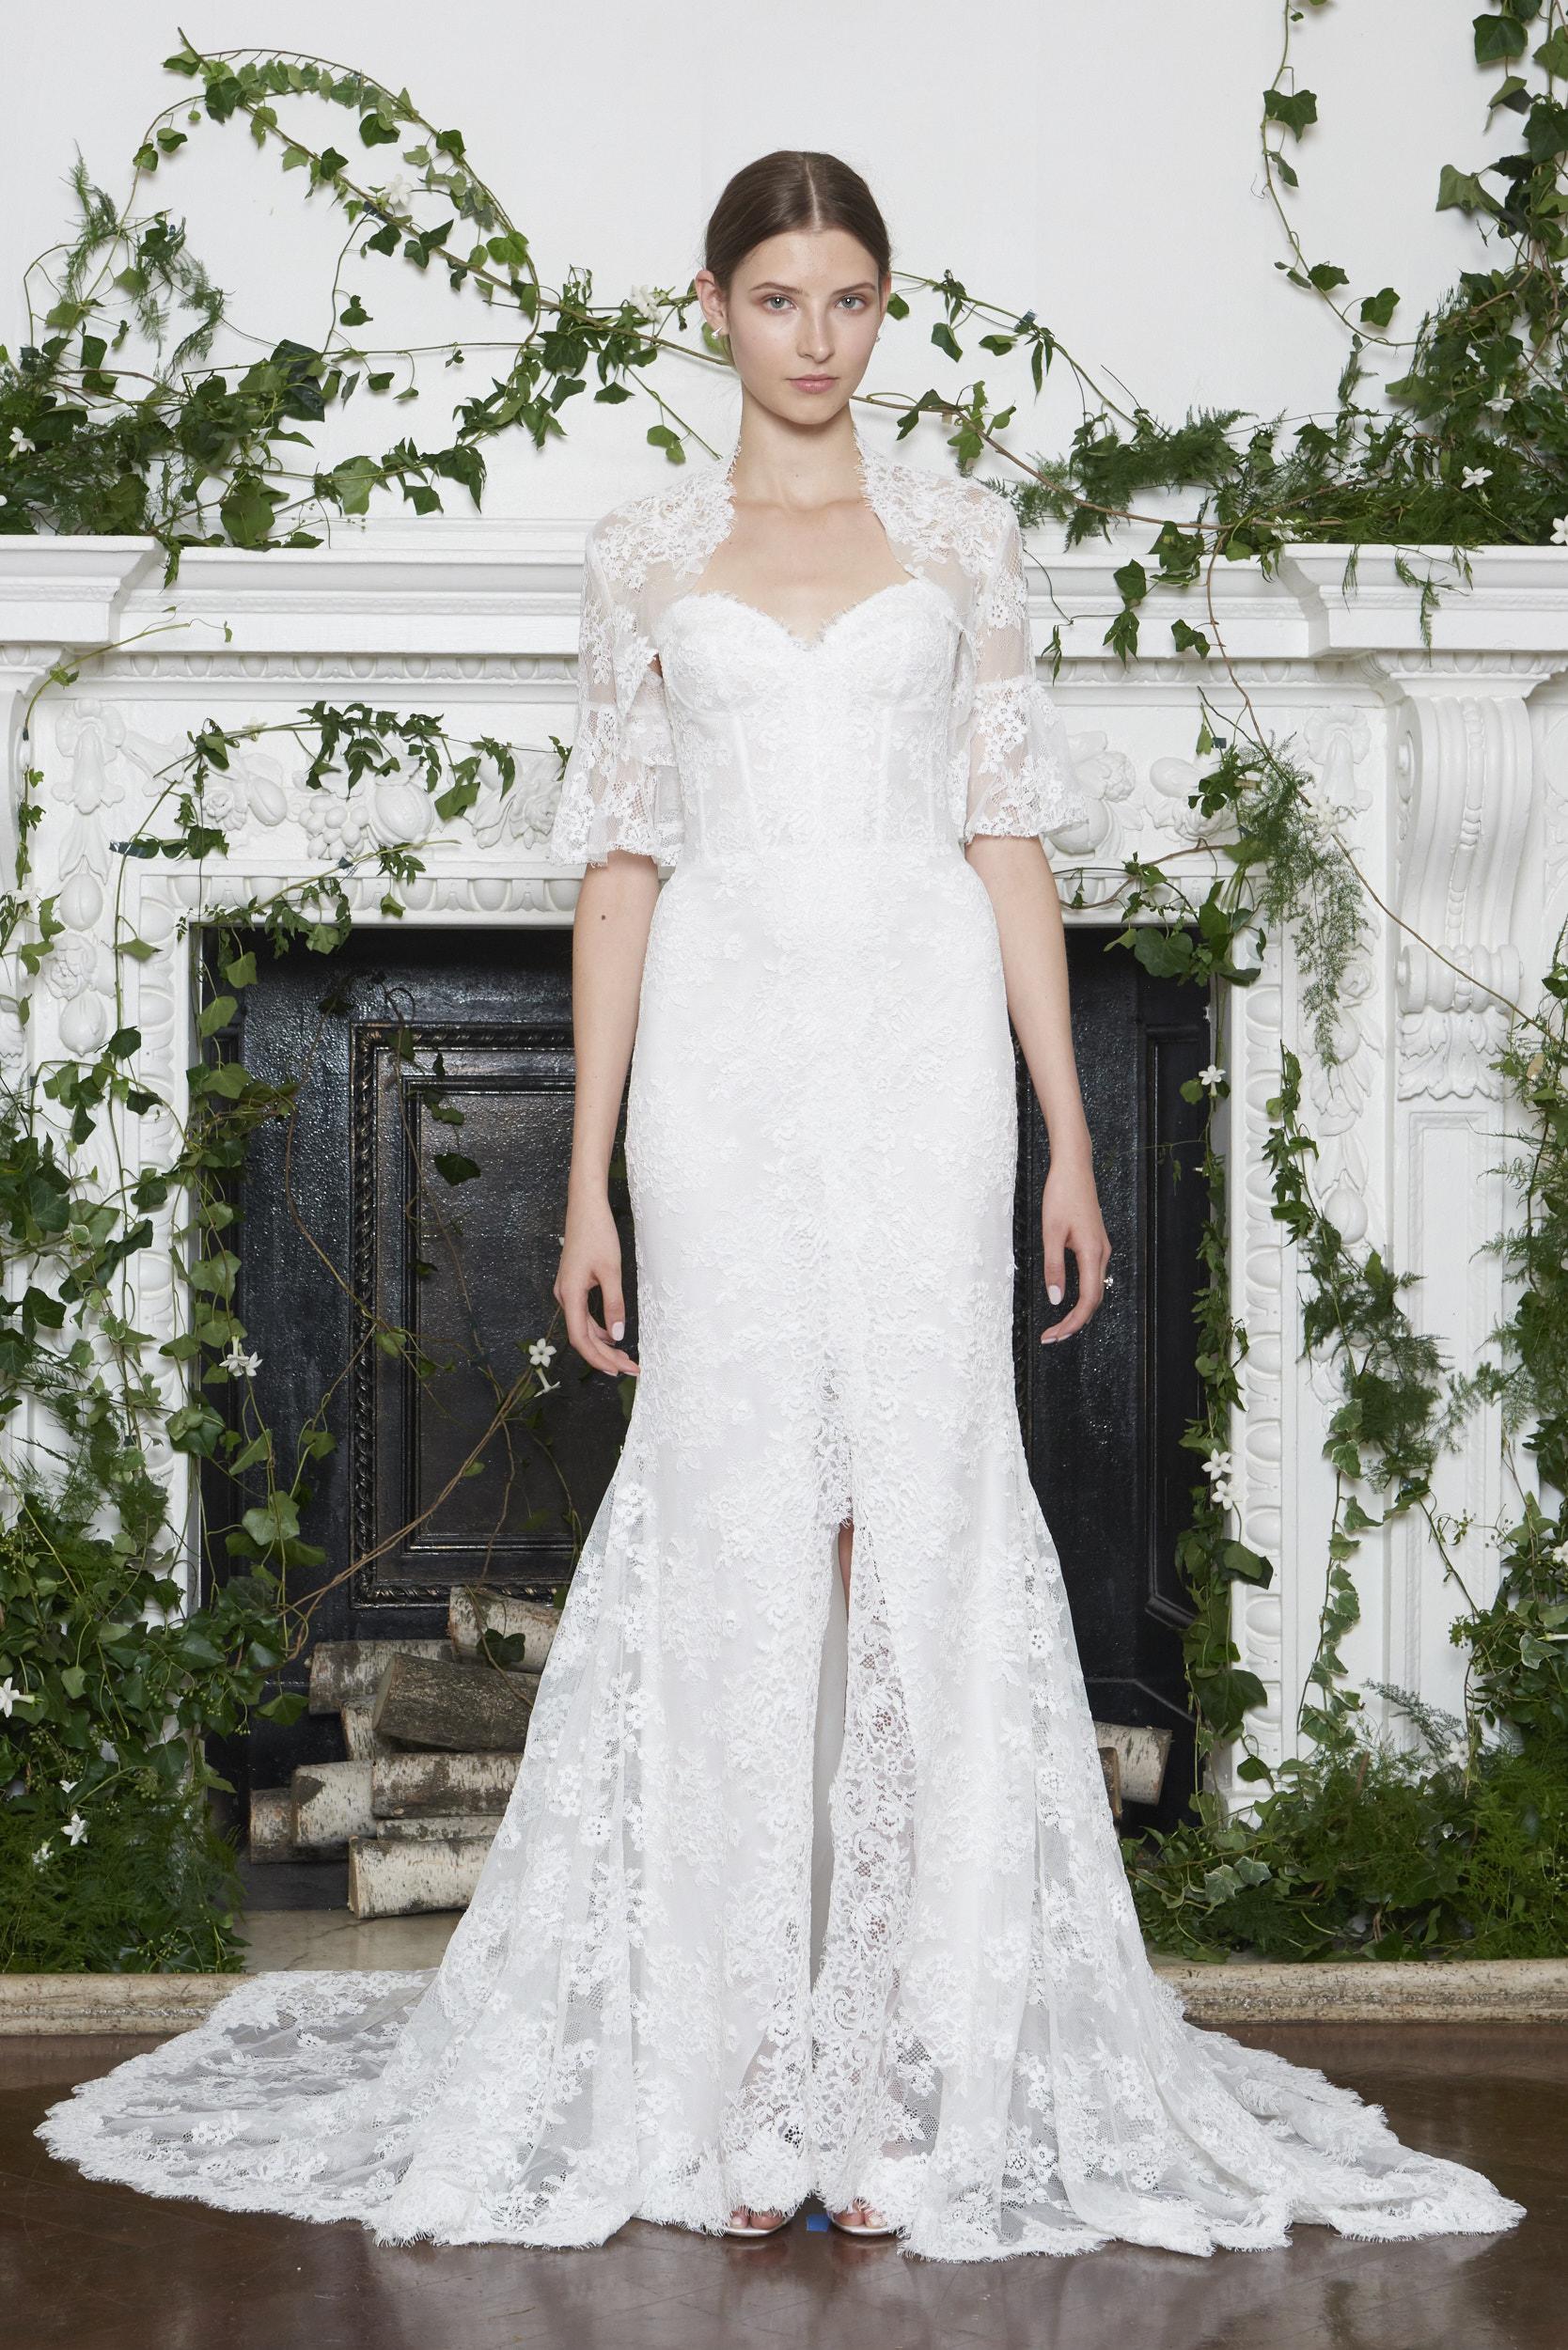 Monique Lhuillier Fall 2018 Strapless Lace Wedding Dress with Bolero